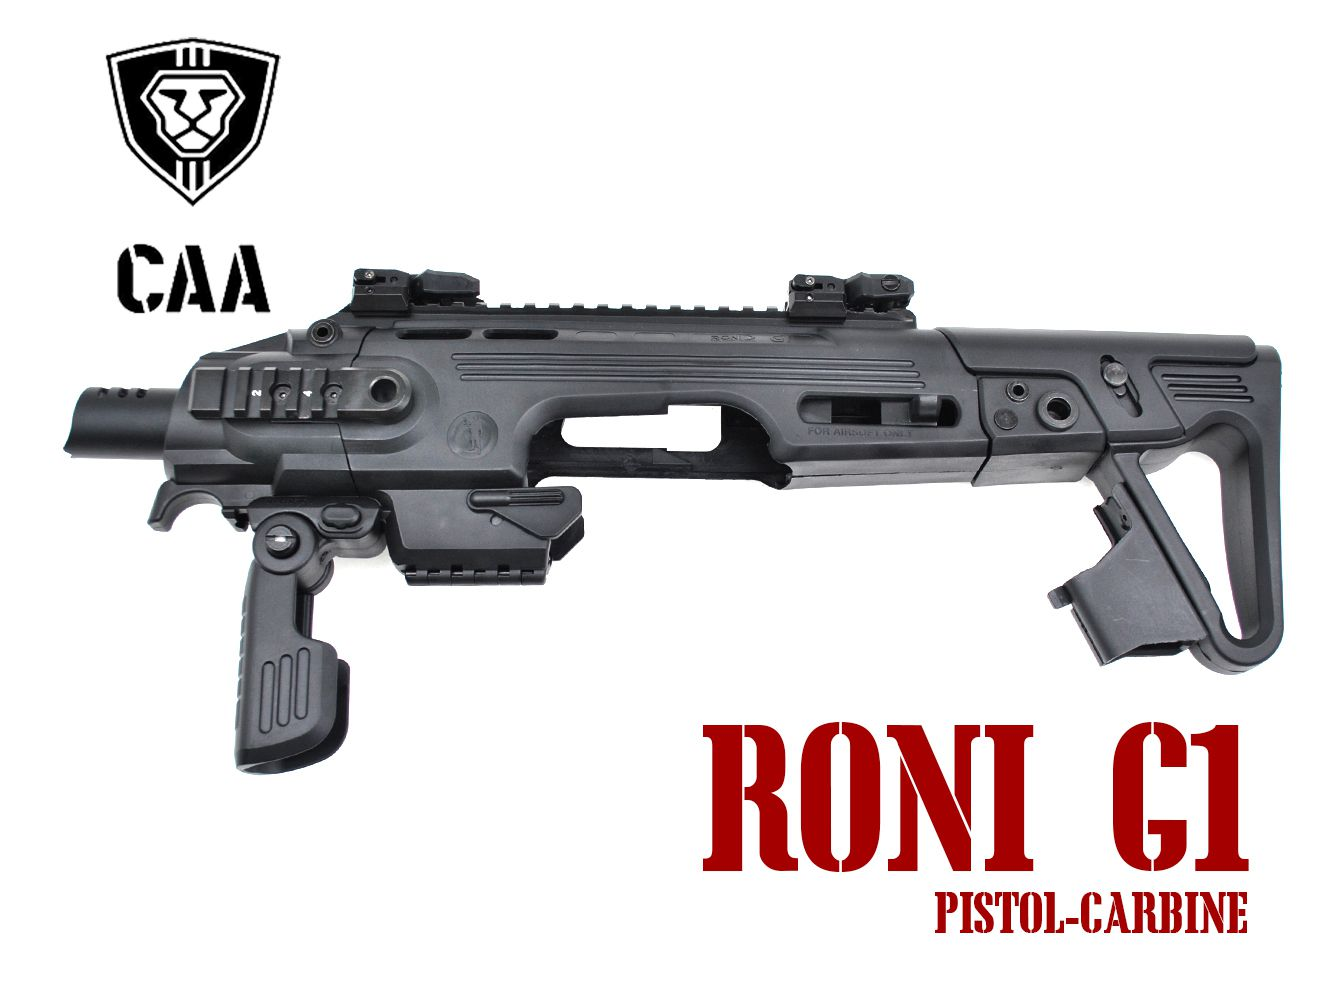 CAA Airsoft RONI G1 Pistol-Carbine コンバージョン for Glock BK